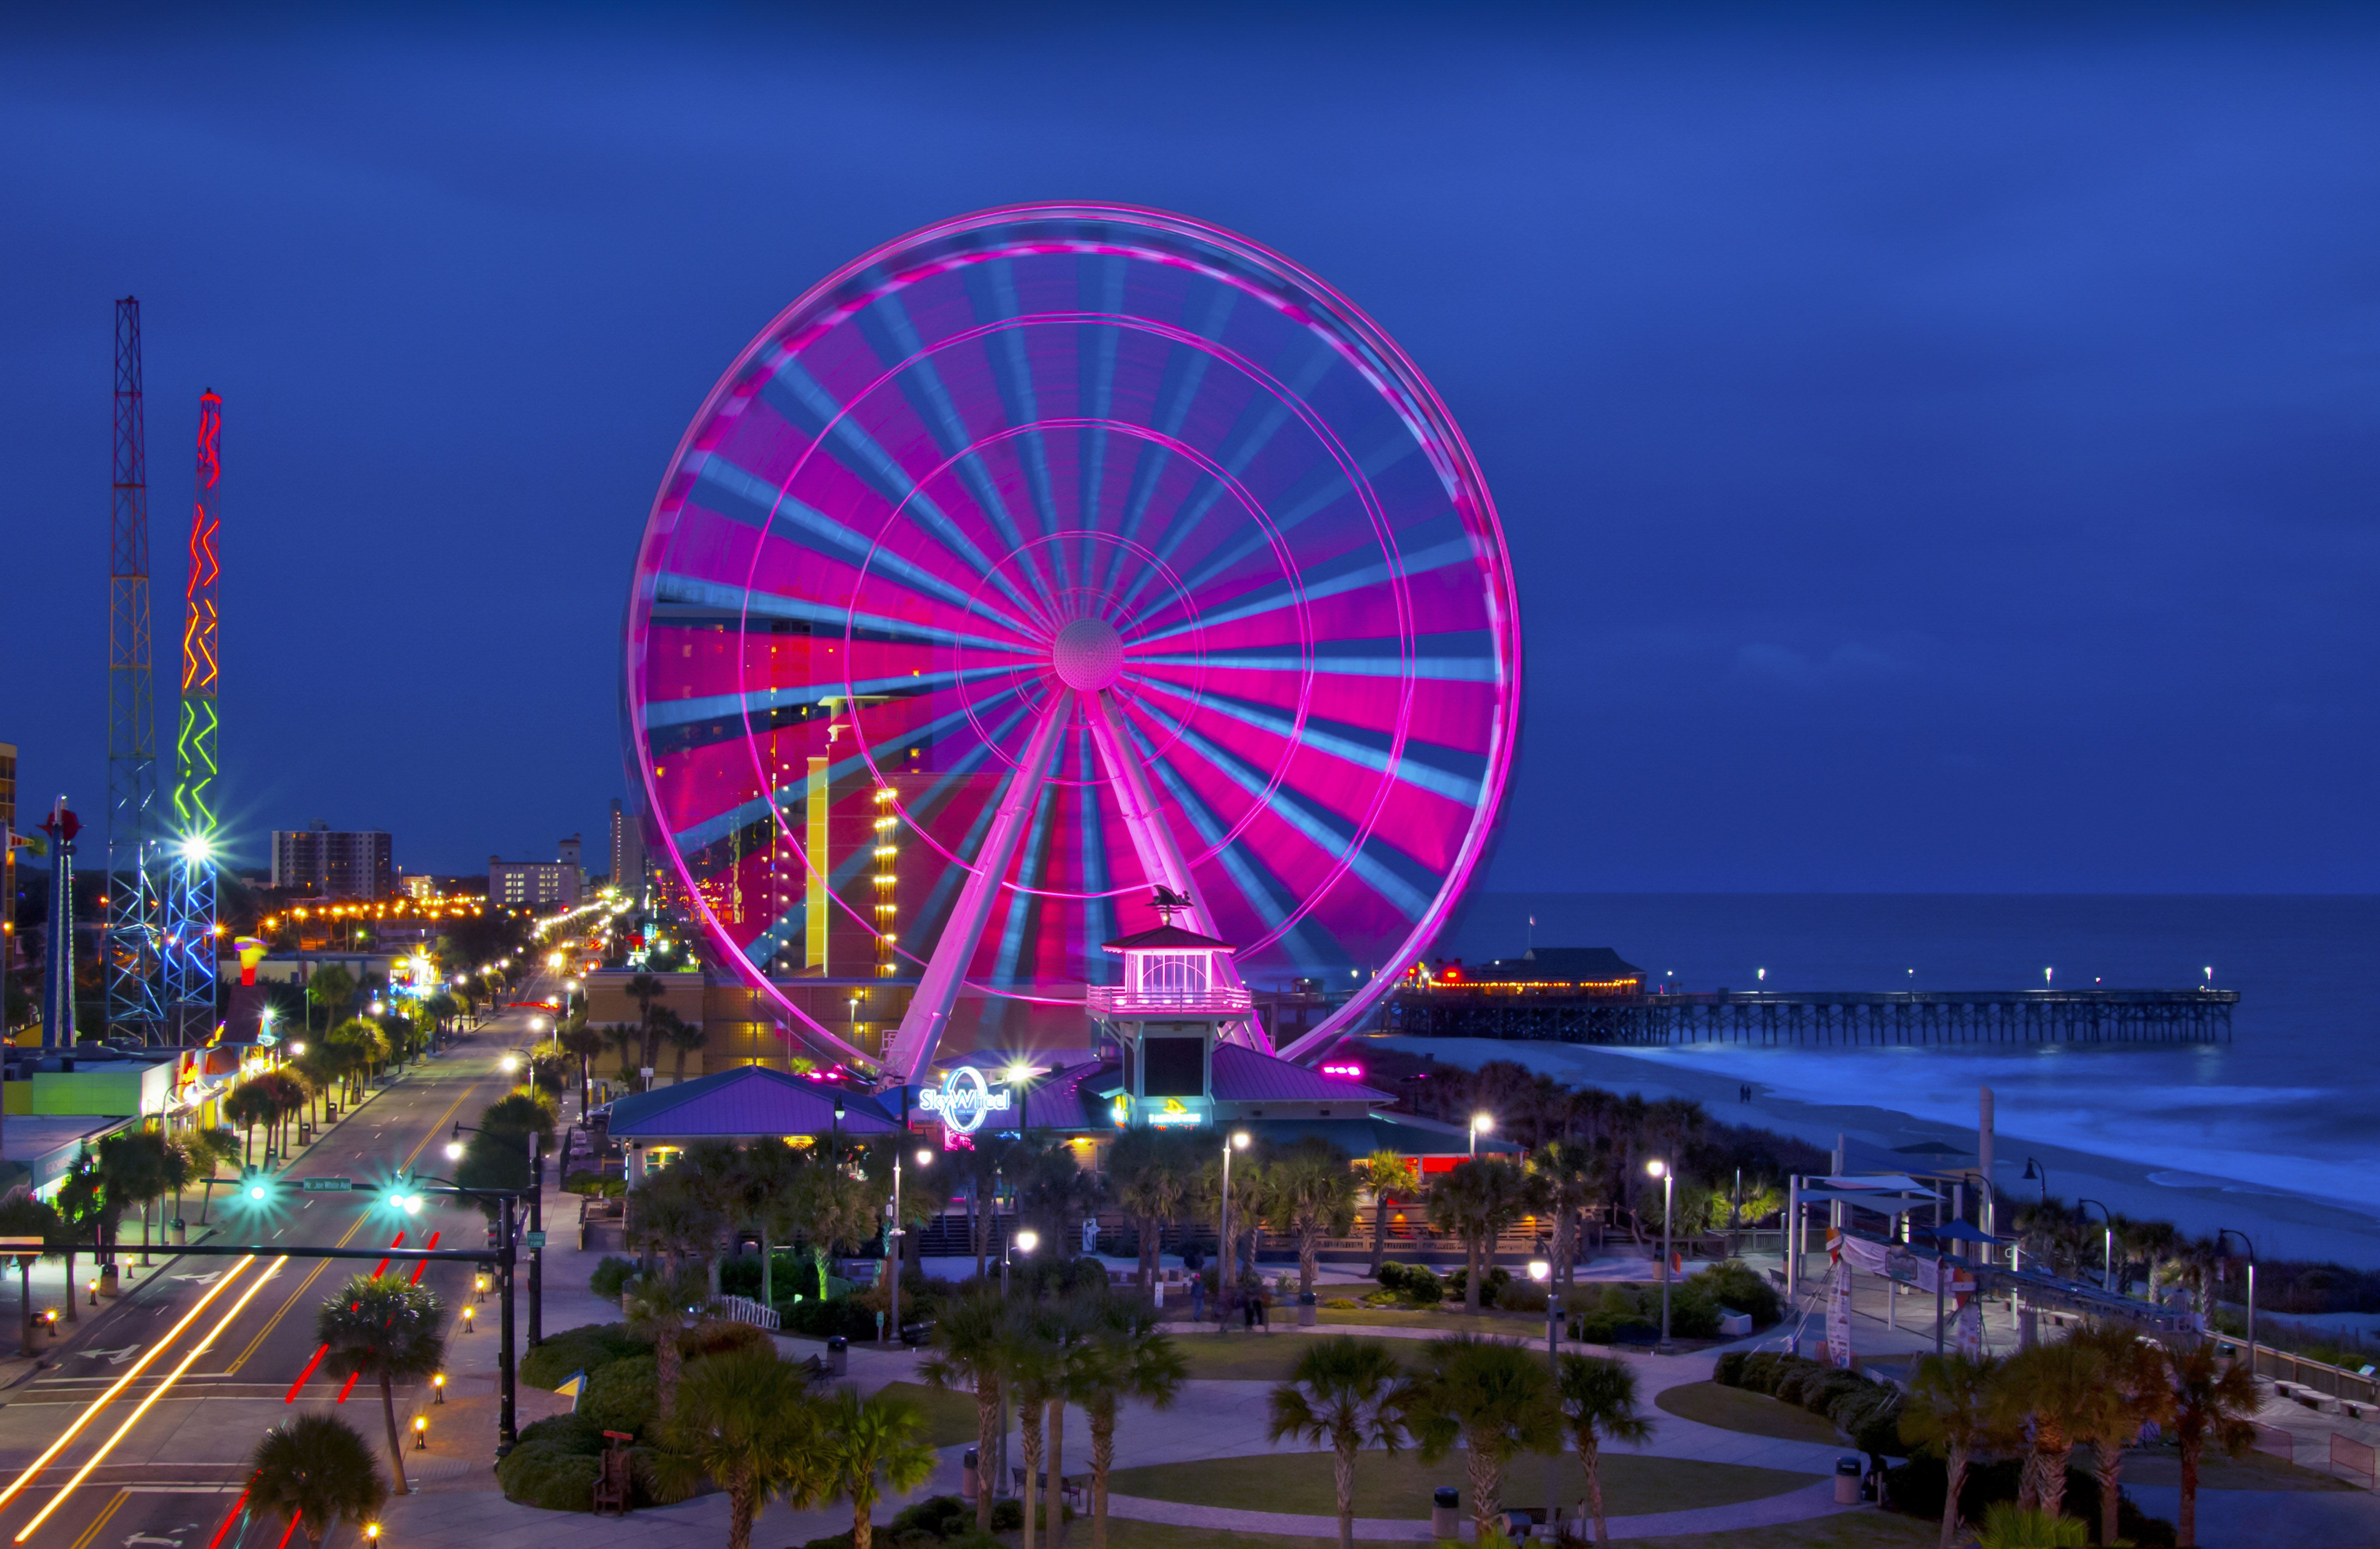 USA, South Carolina, Myrtle Beach, Illuminated Ferris wheel on Grand Strand